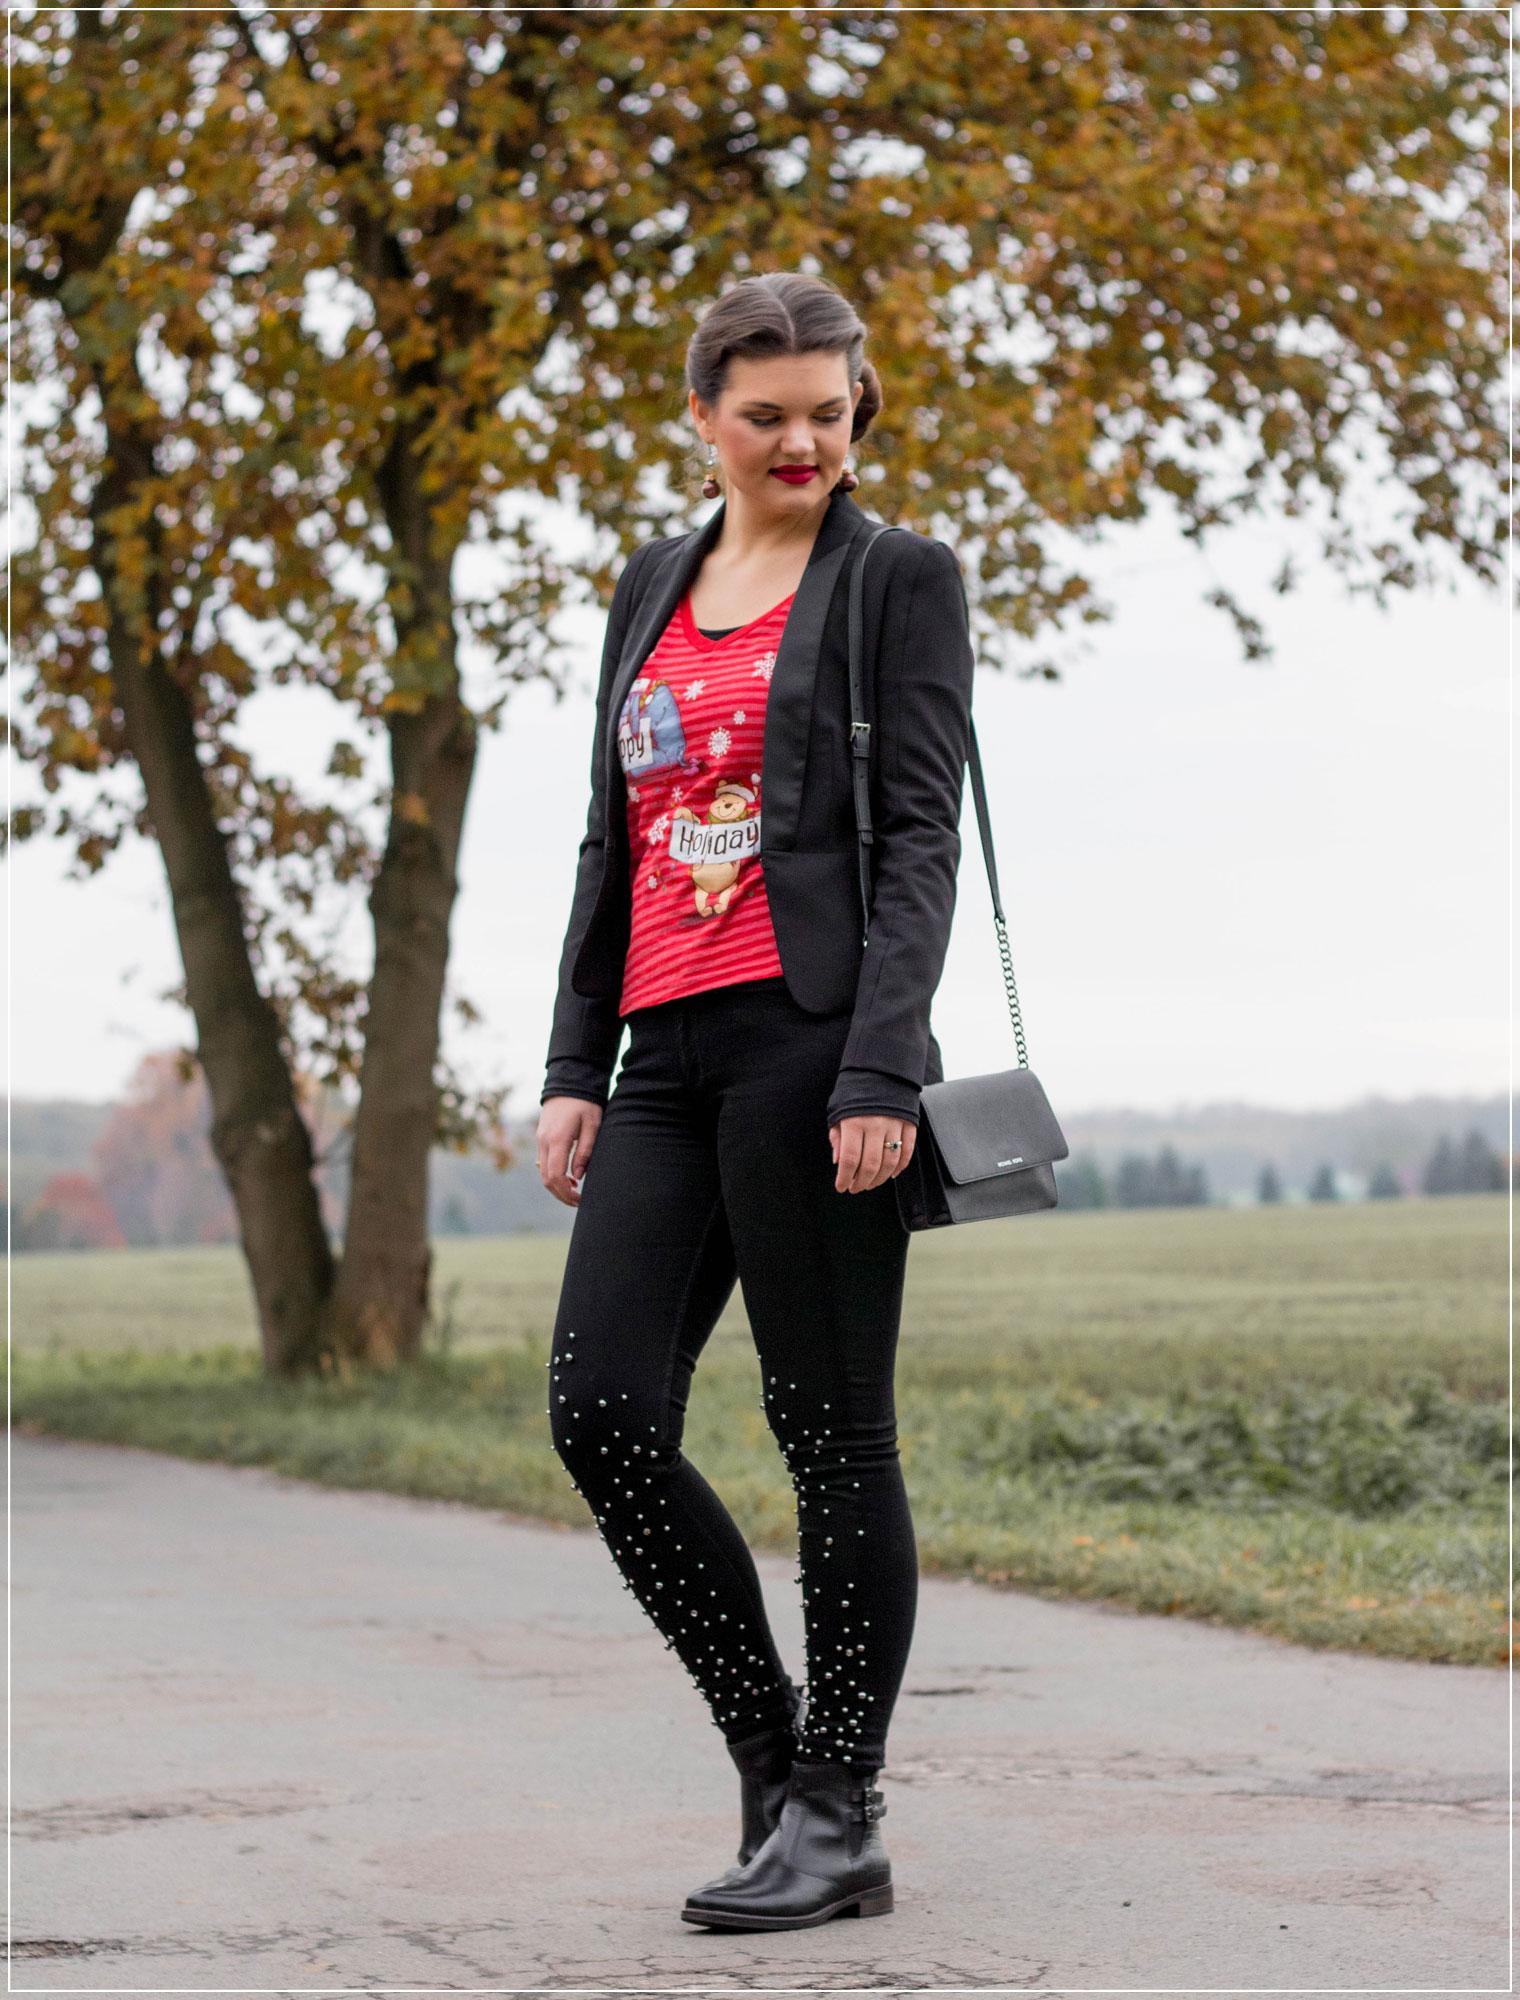 Weihnachts-Shirt, Disney-Fashion, Ugly Christmas Sweater, Outfit für Weihnachtsfeier,, Modetrend, Styleguide, Outfitinspiration, Modebloggerin, Fashionbloggerin, Modeblog, Ruhrgebiet